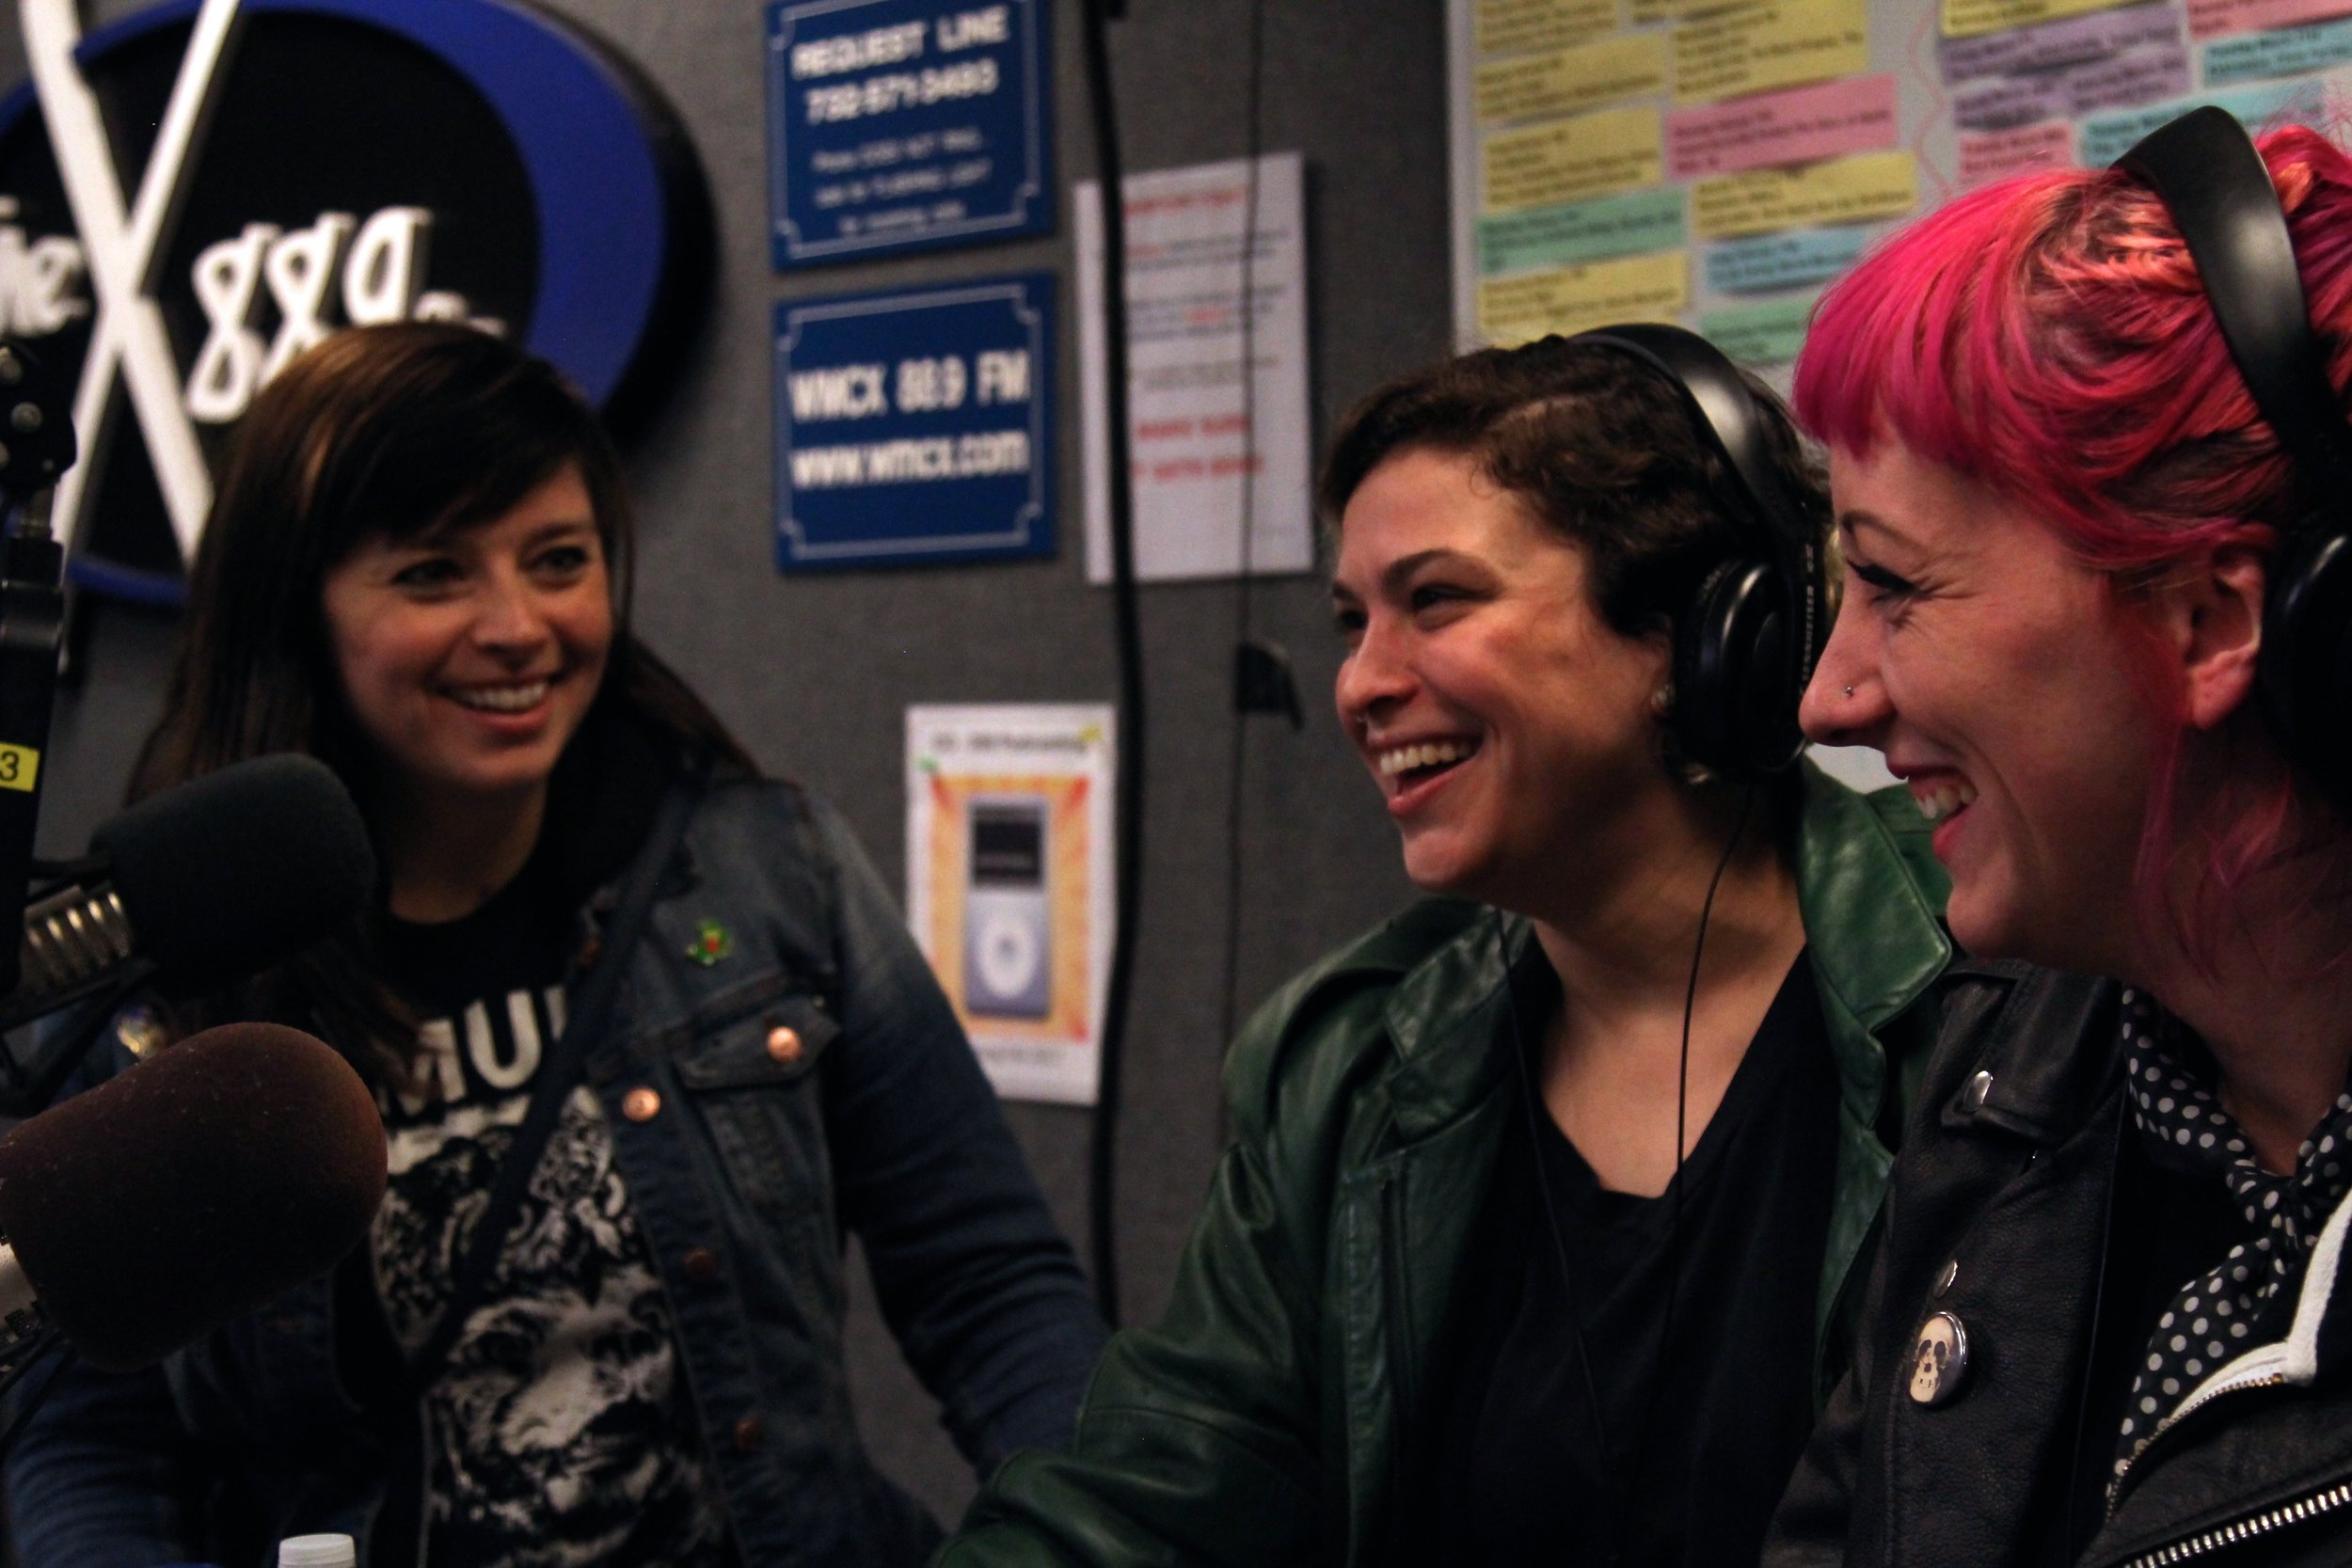 From left to right: Kelly Olsen, Allegra Anka, and Augusta Koch of Cayetana